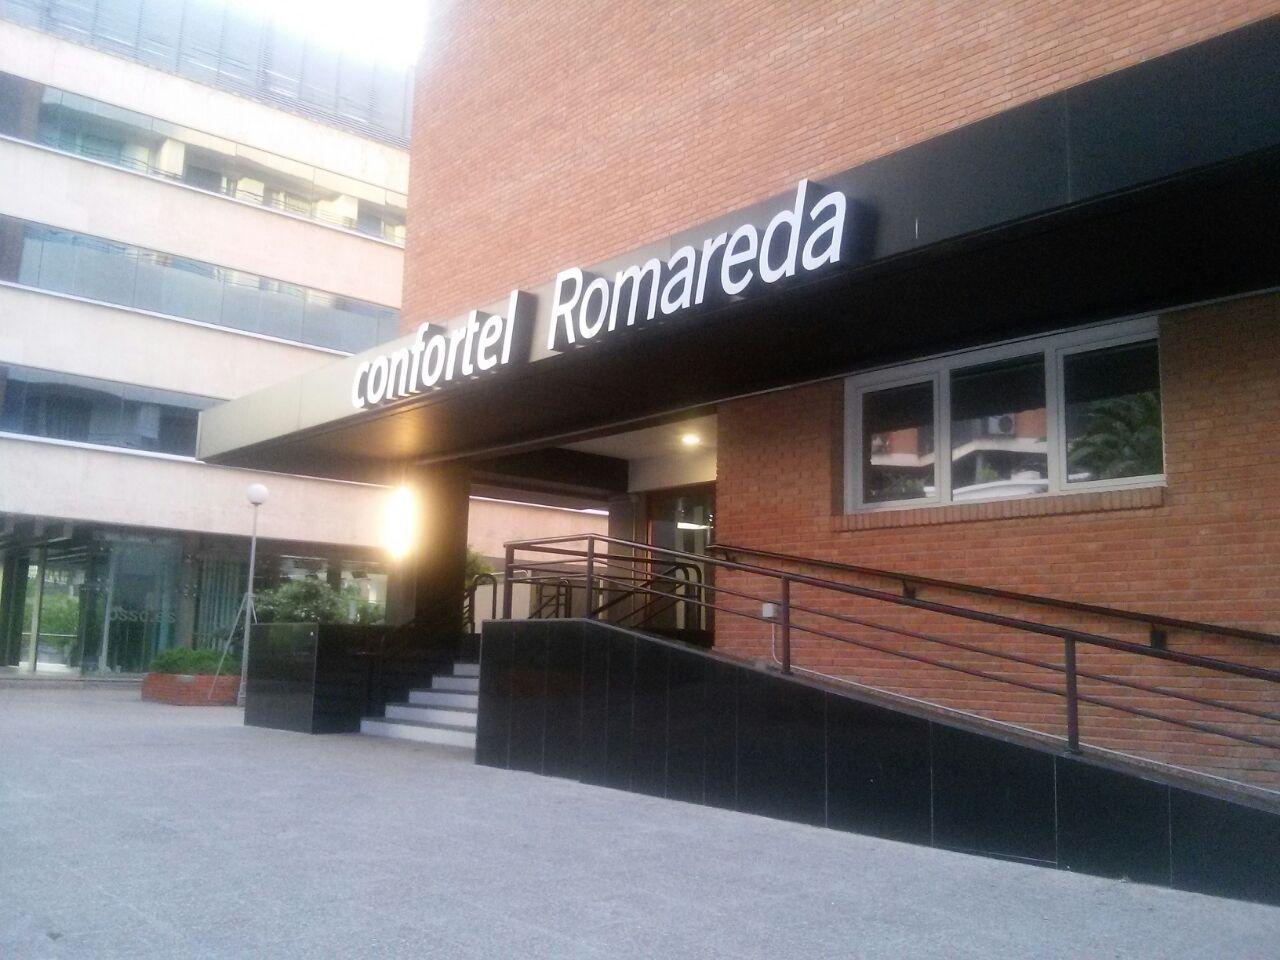 Hotel Romareda - Zaragoza